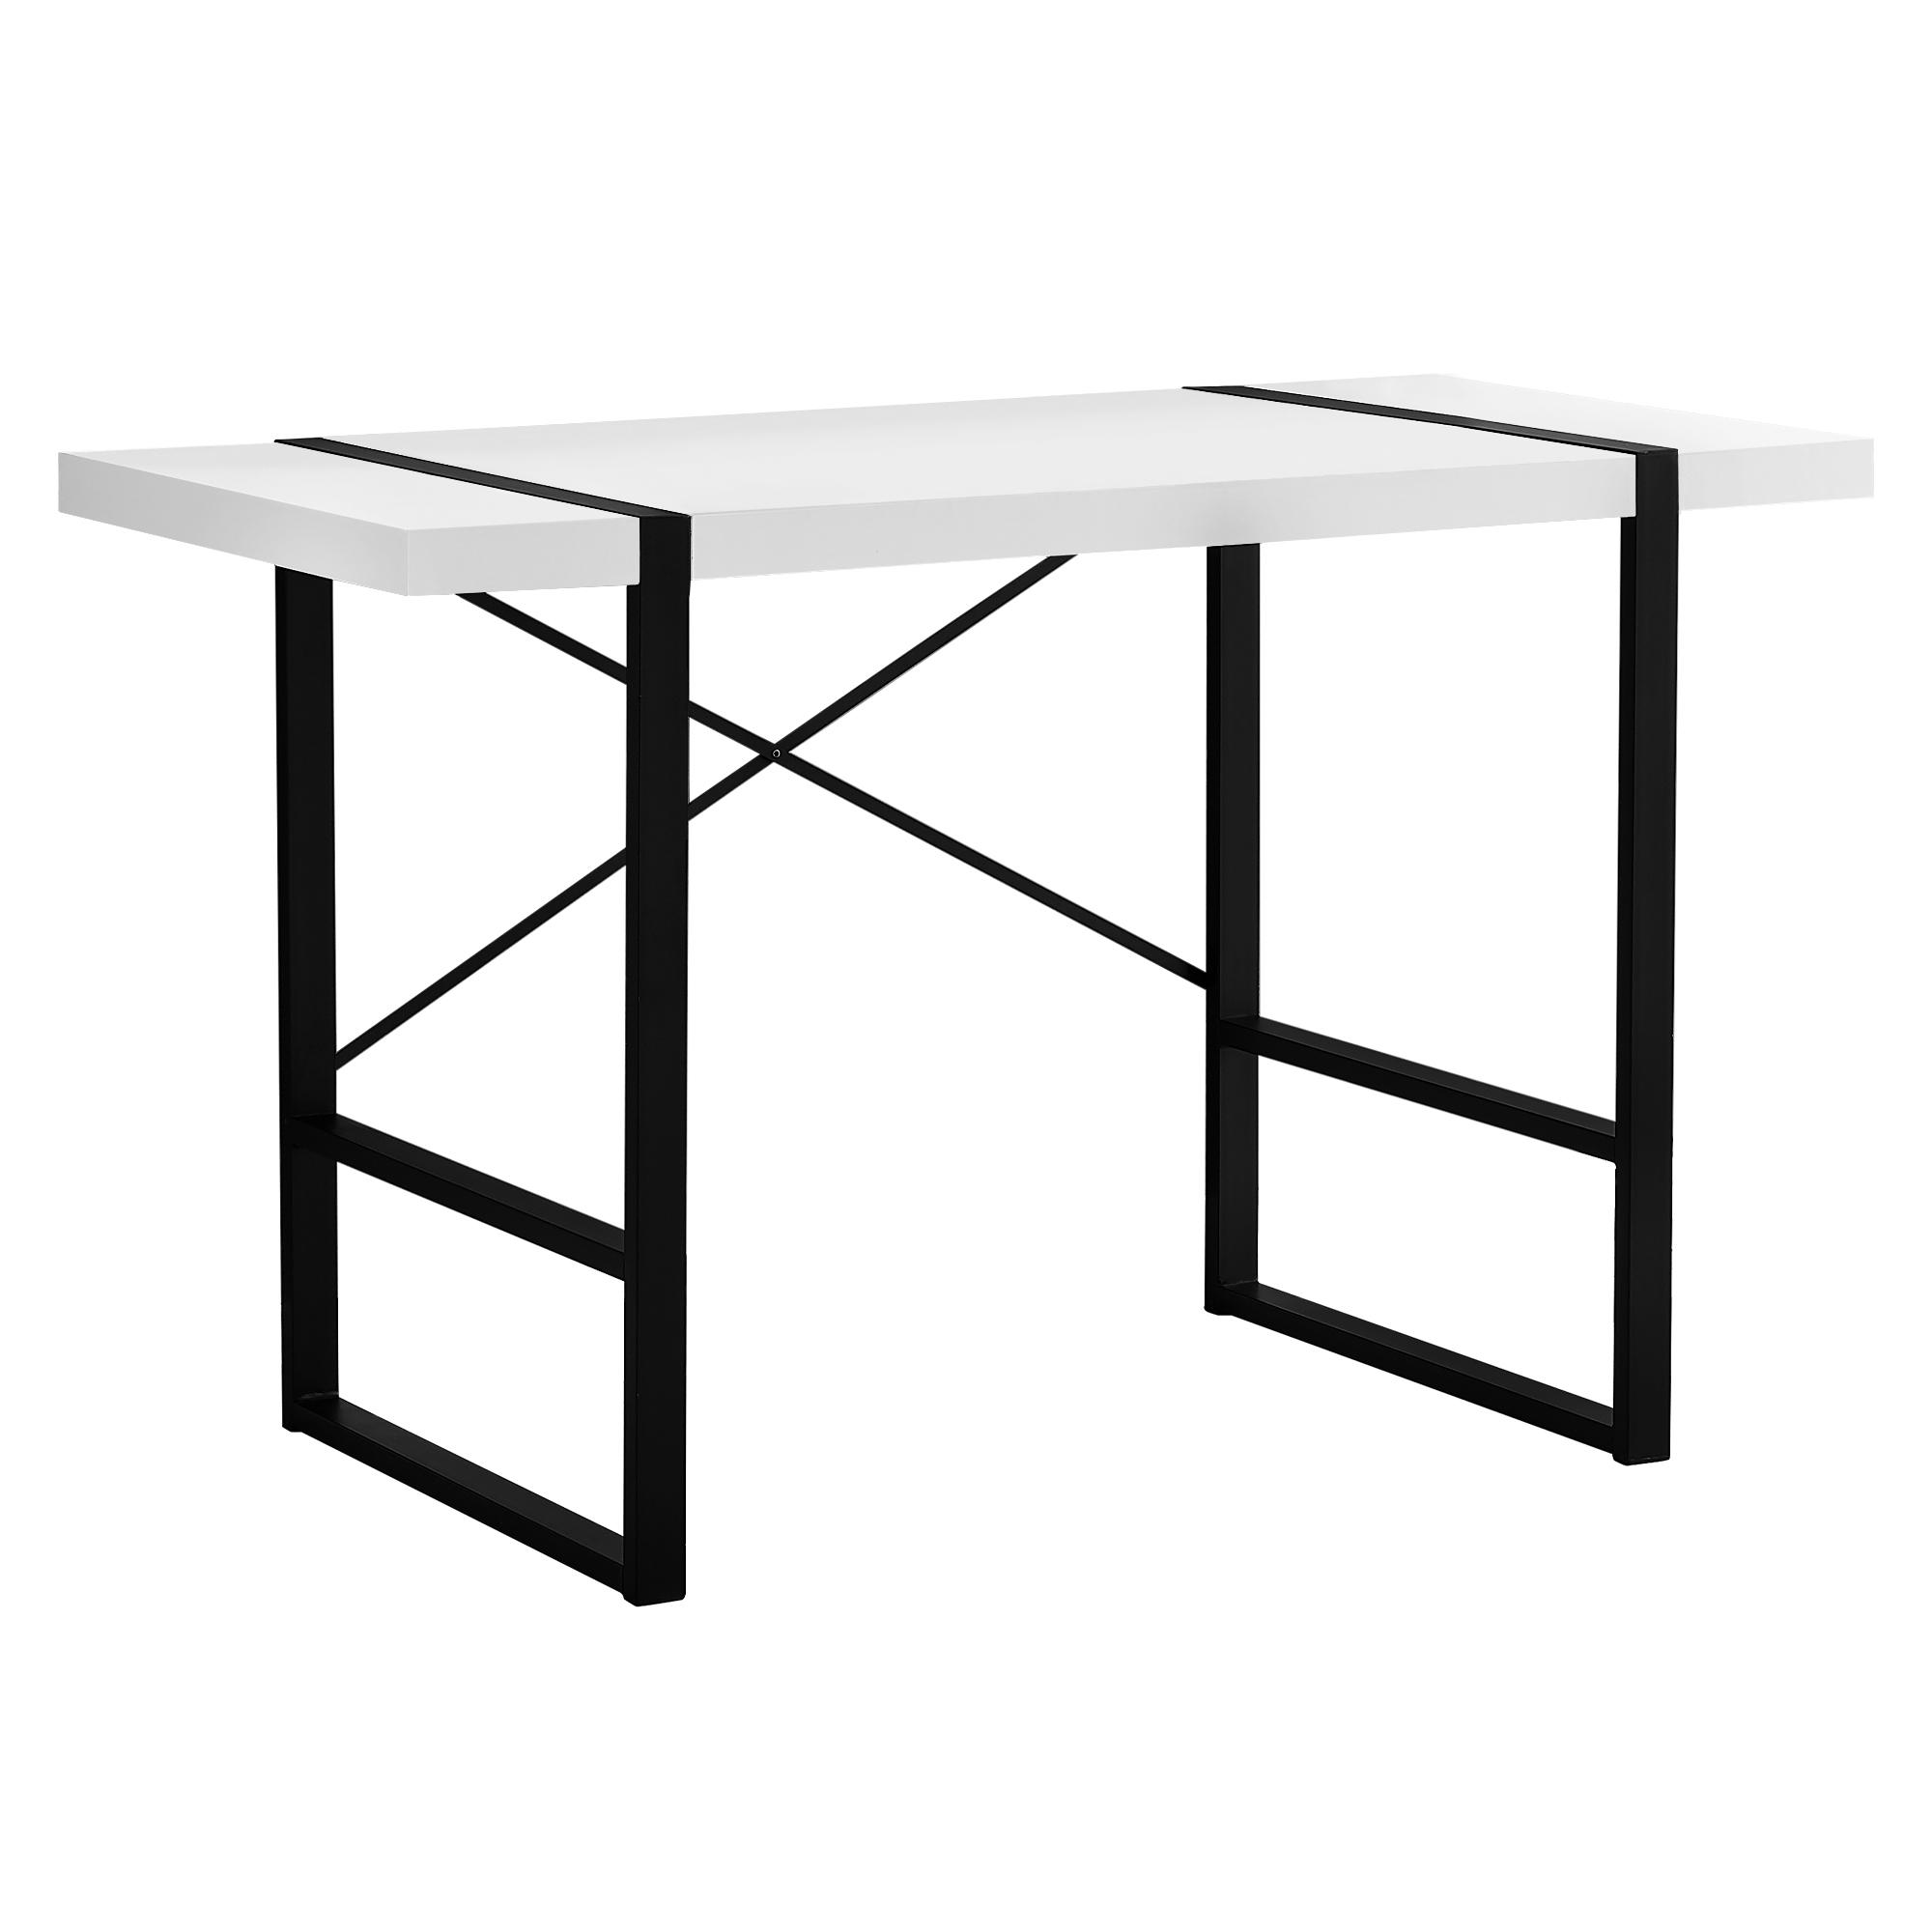 "23.75"" x 49"" x 30"" White Black Particle Board Hollow Core Metal  Computer Desk"